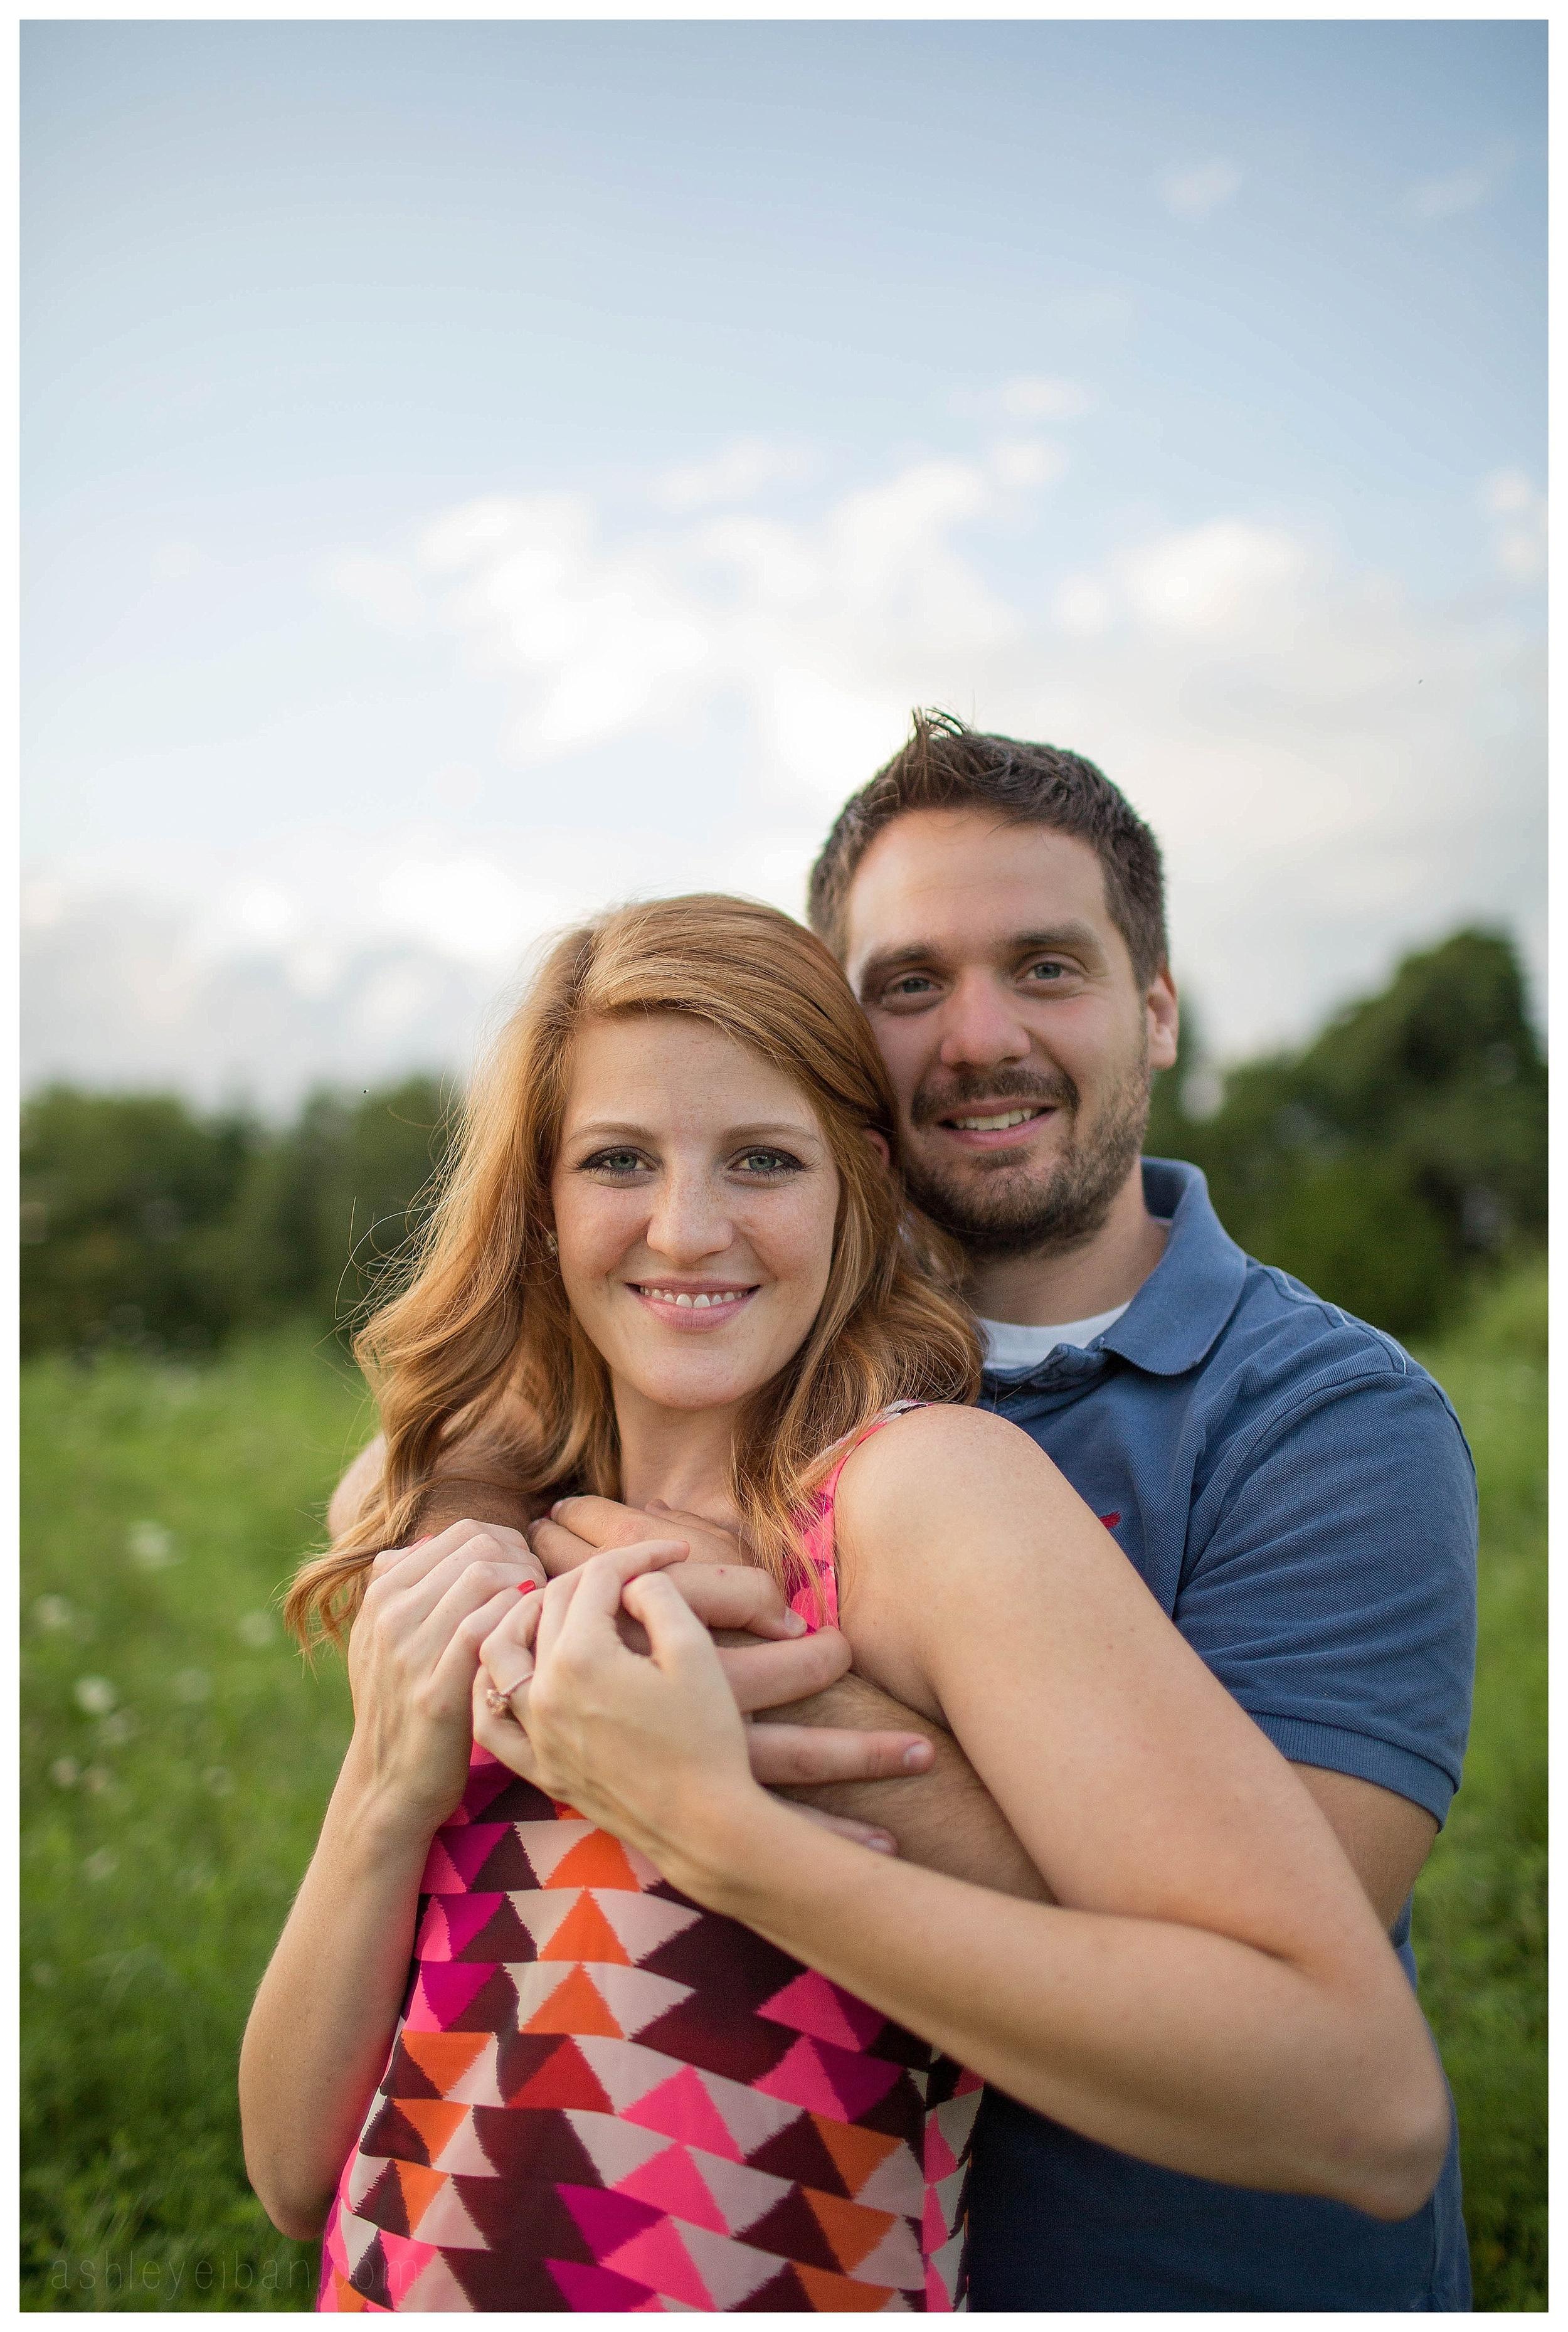 Lynchburg Virginia Wedding and Engagement Photographer, Save the Date Photography, Ashley Eiban Photography, www.ashleyeiban.com